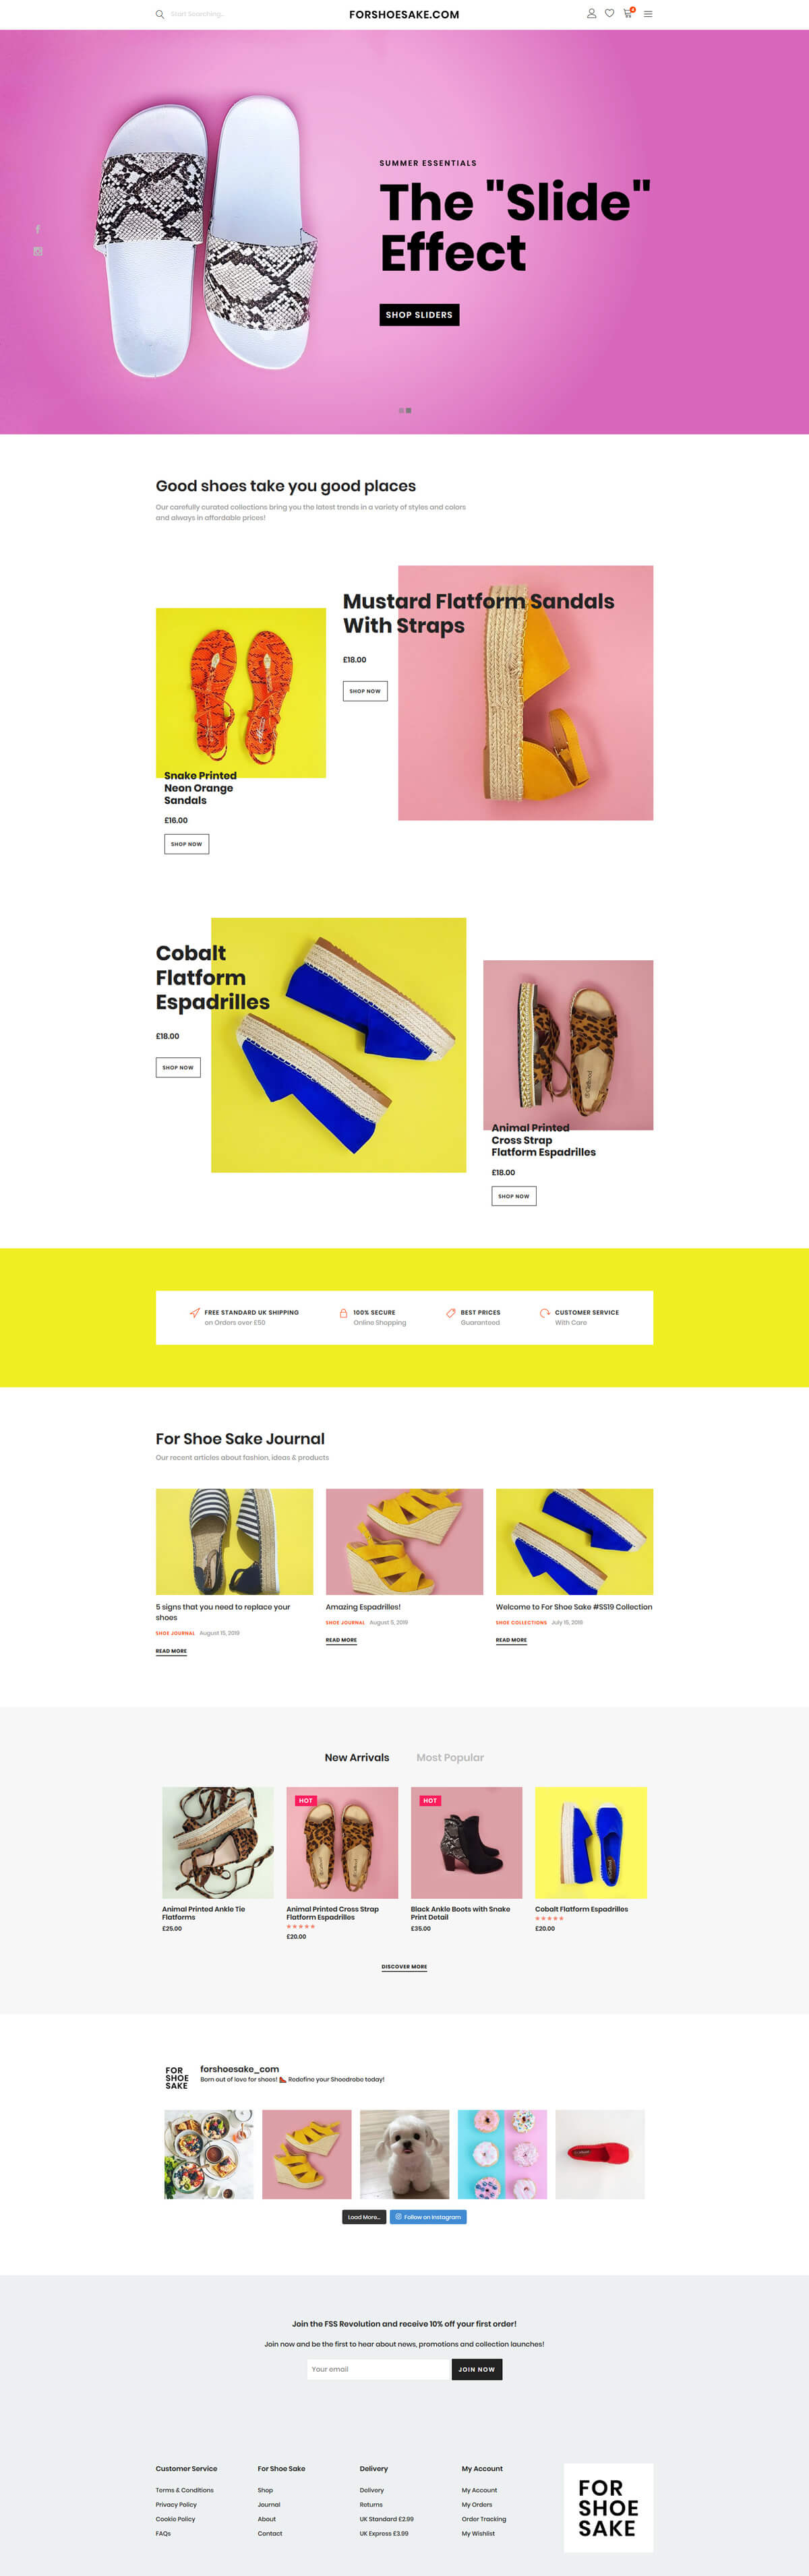 For Shoe Sake - forshoesake.com - Case Study 1 - developed by Digital Artifacts Creative